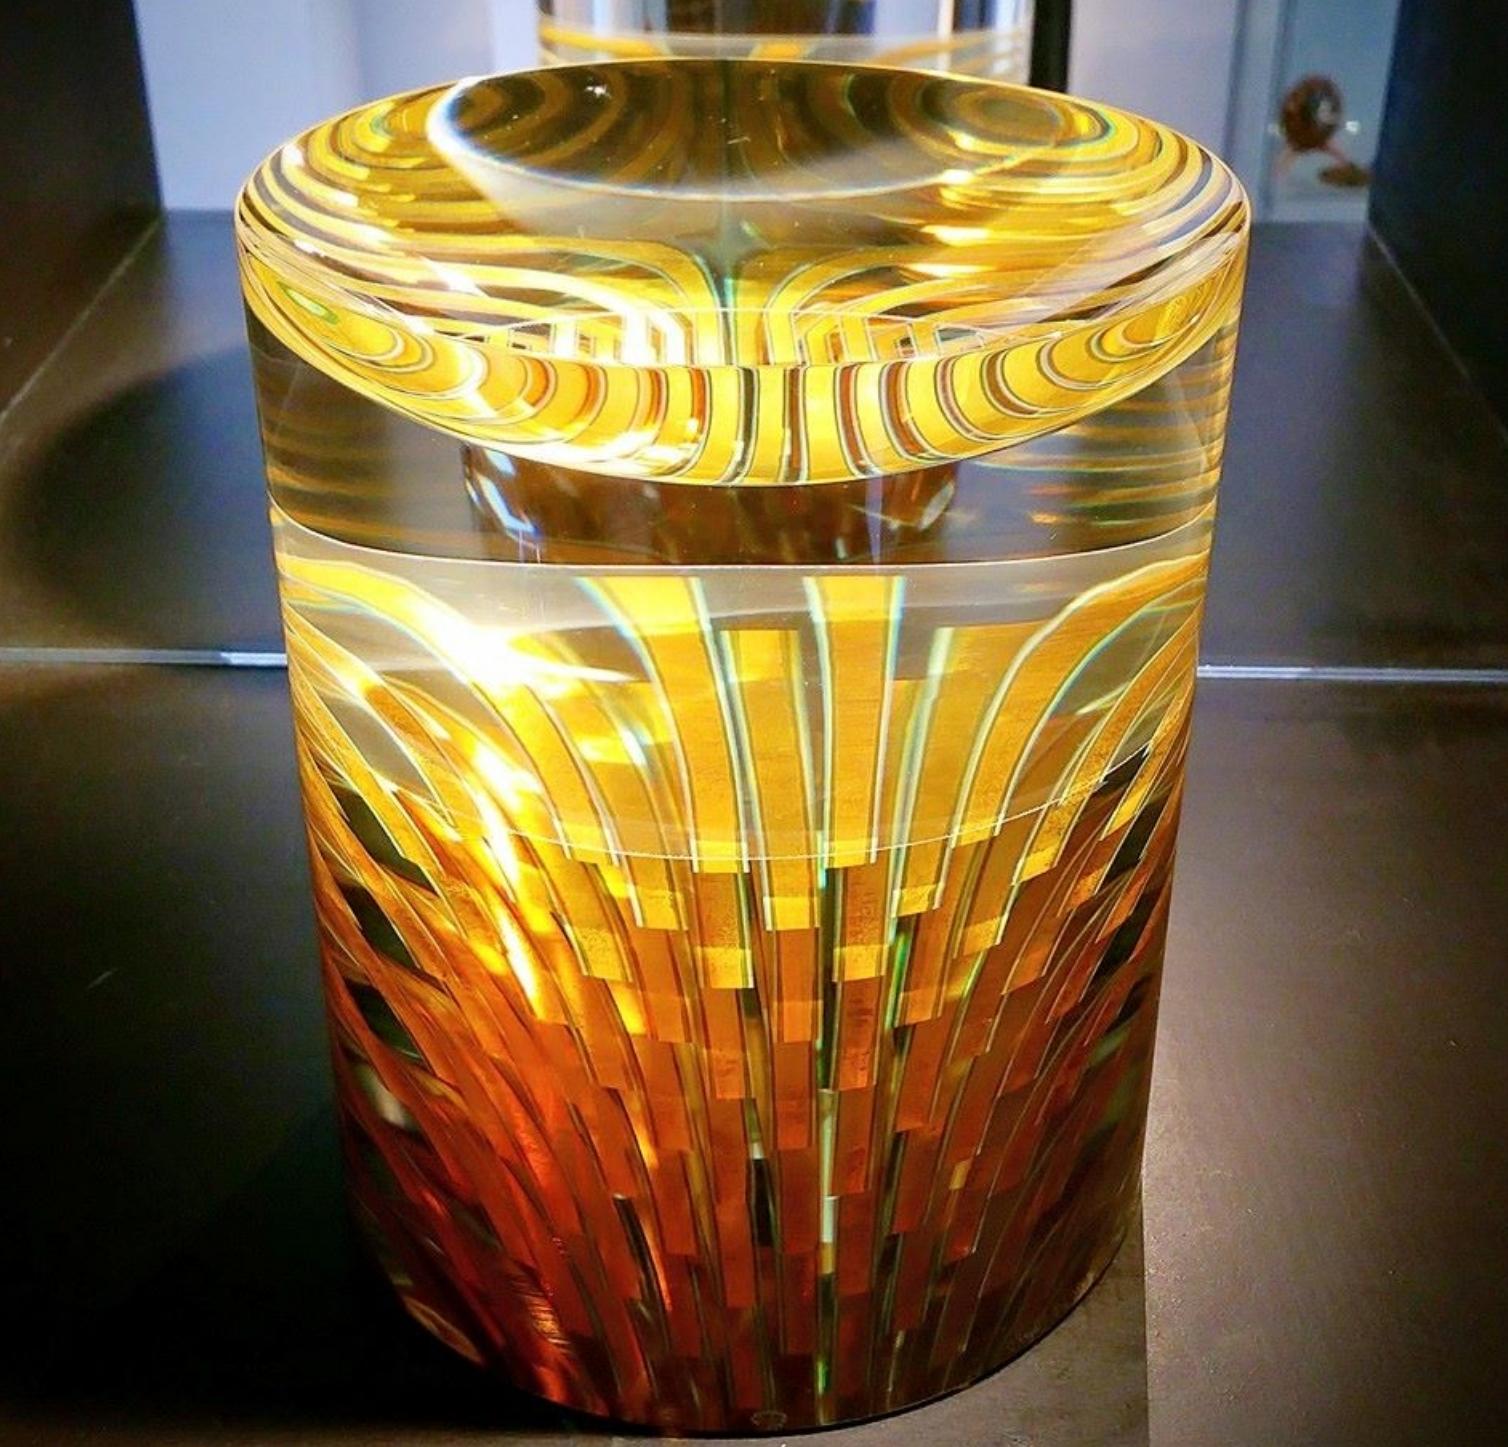 Glass art by Czech artist Tomas Hlavicka